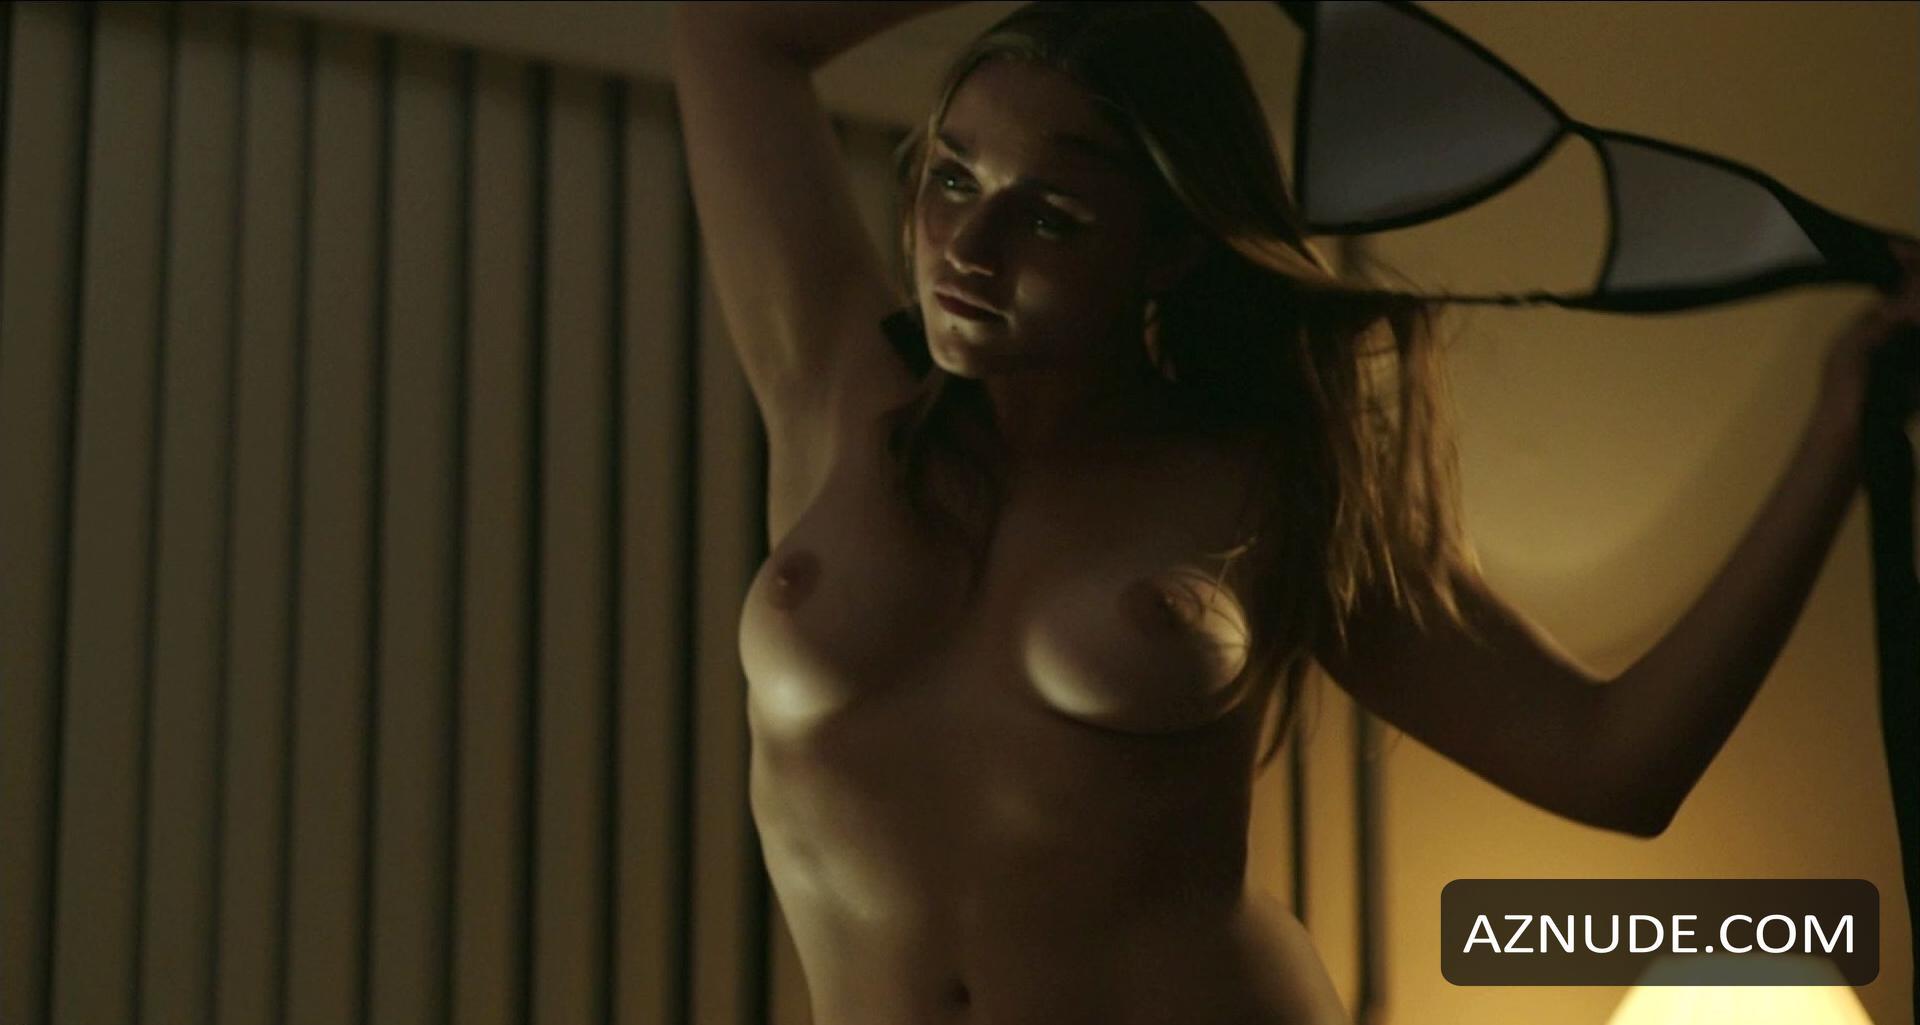 Big breast nude image-2292